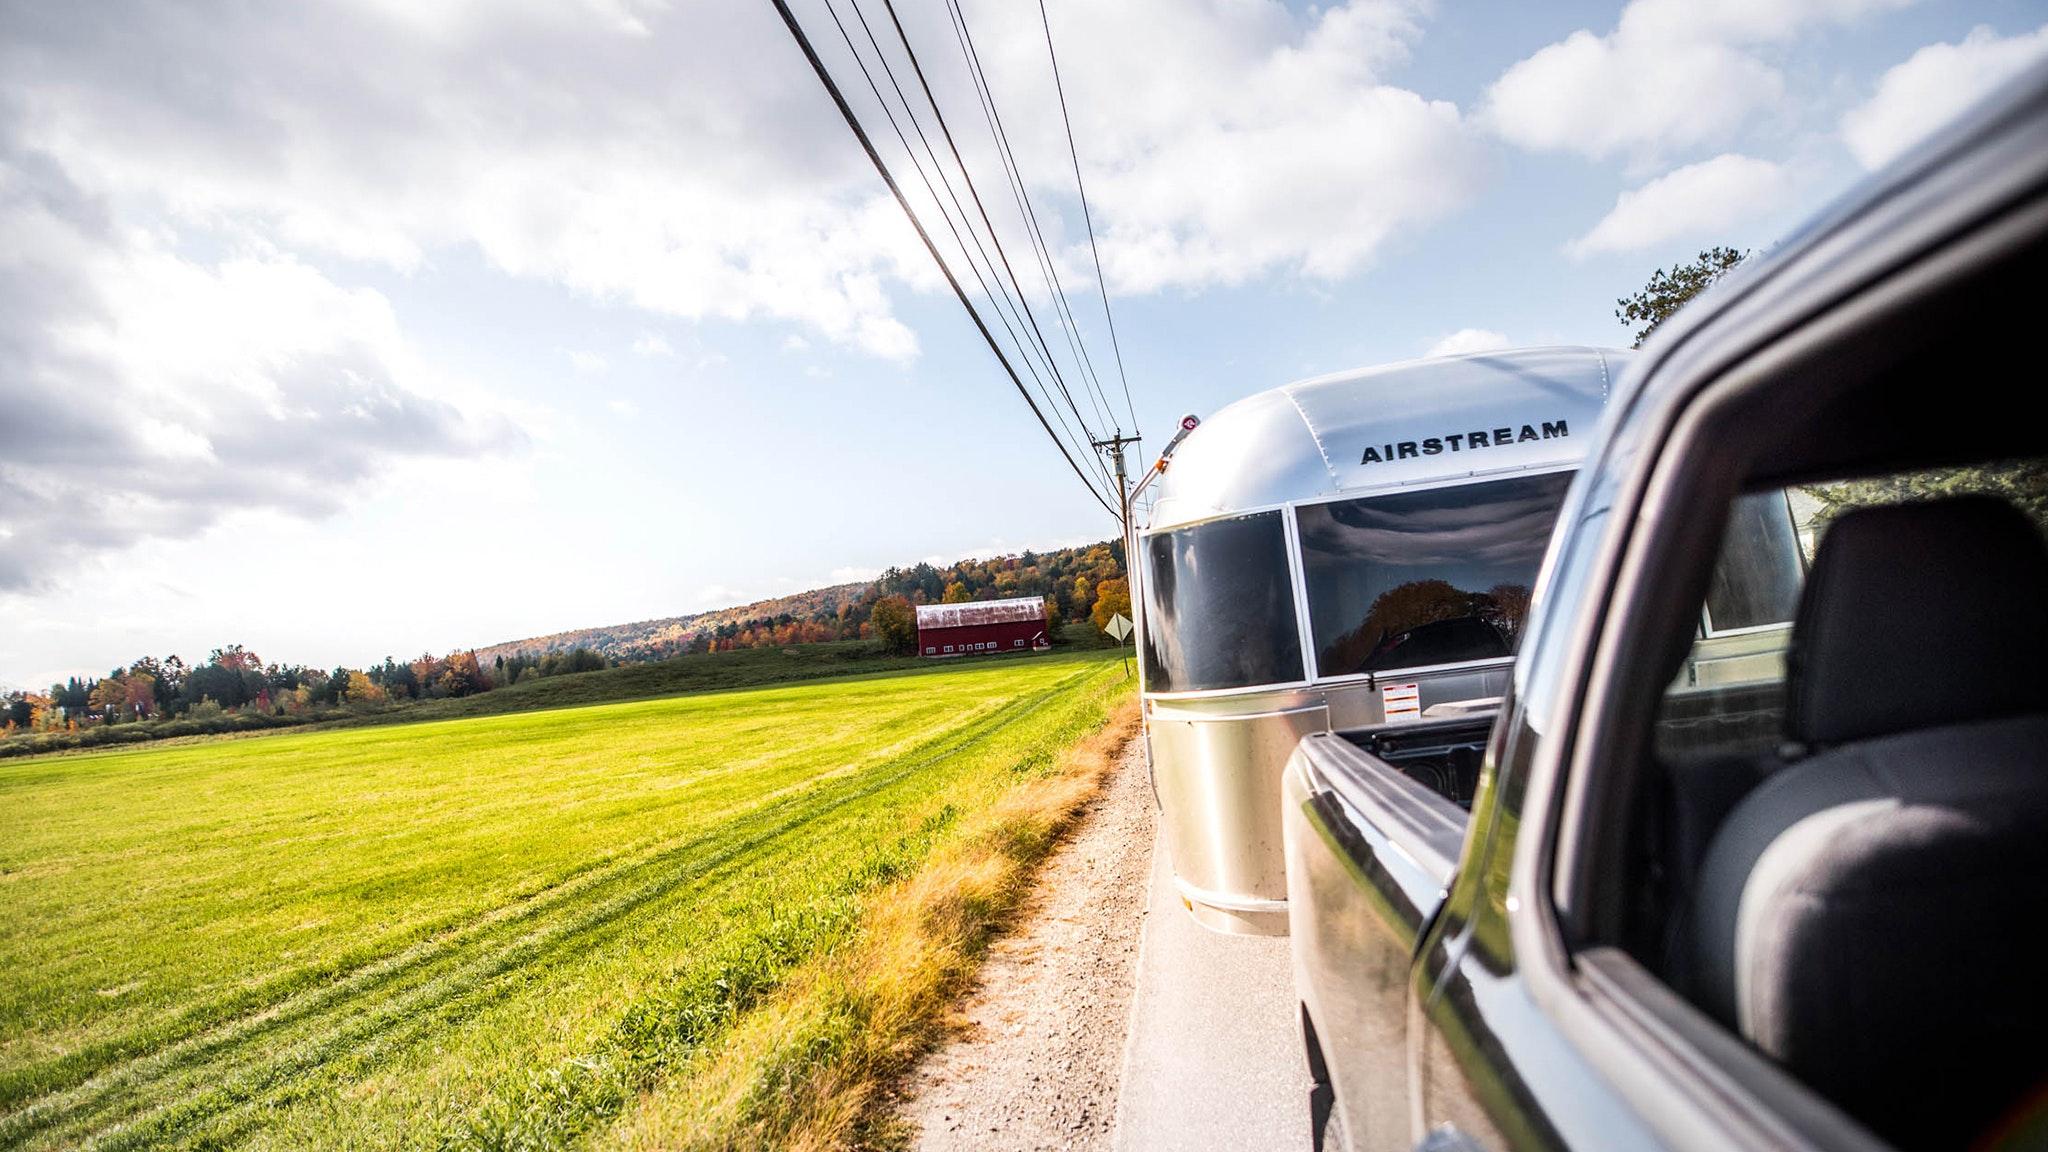 Airstream-Travel-Trailer-Anticipation-Matters-blog-desktop-feature